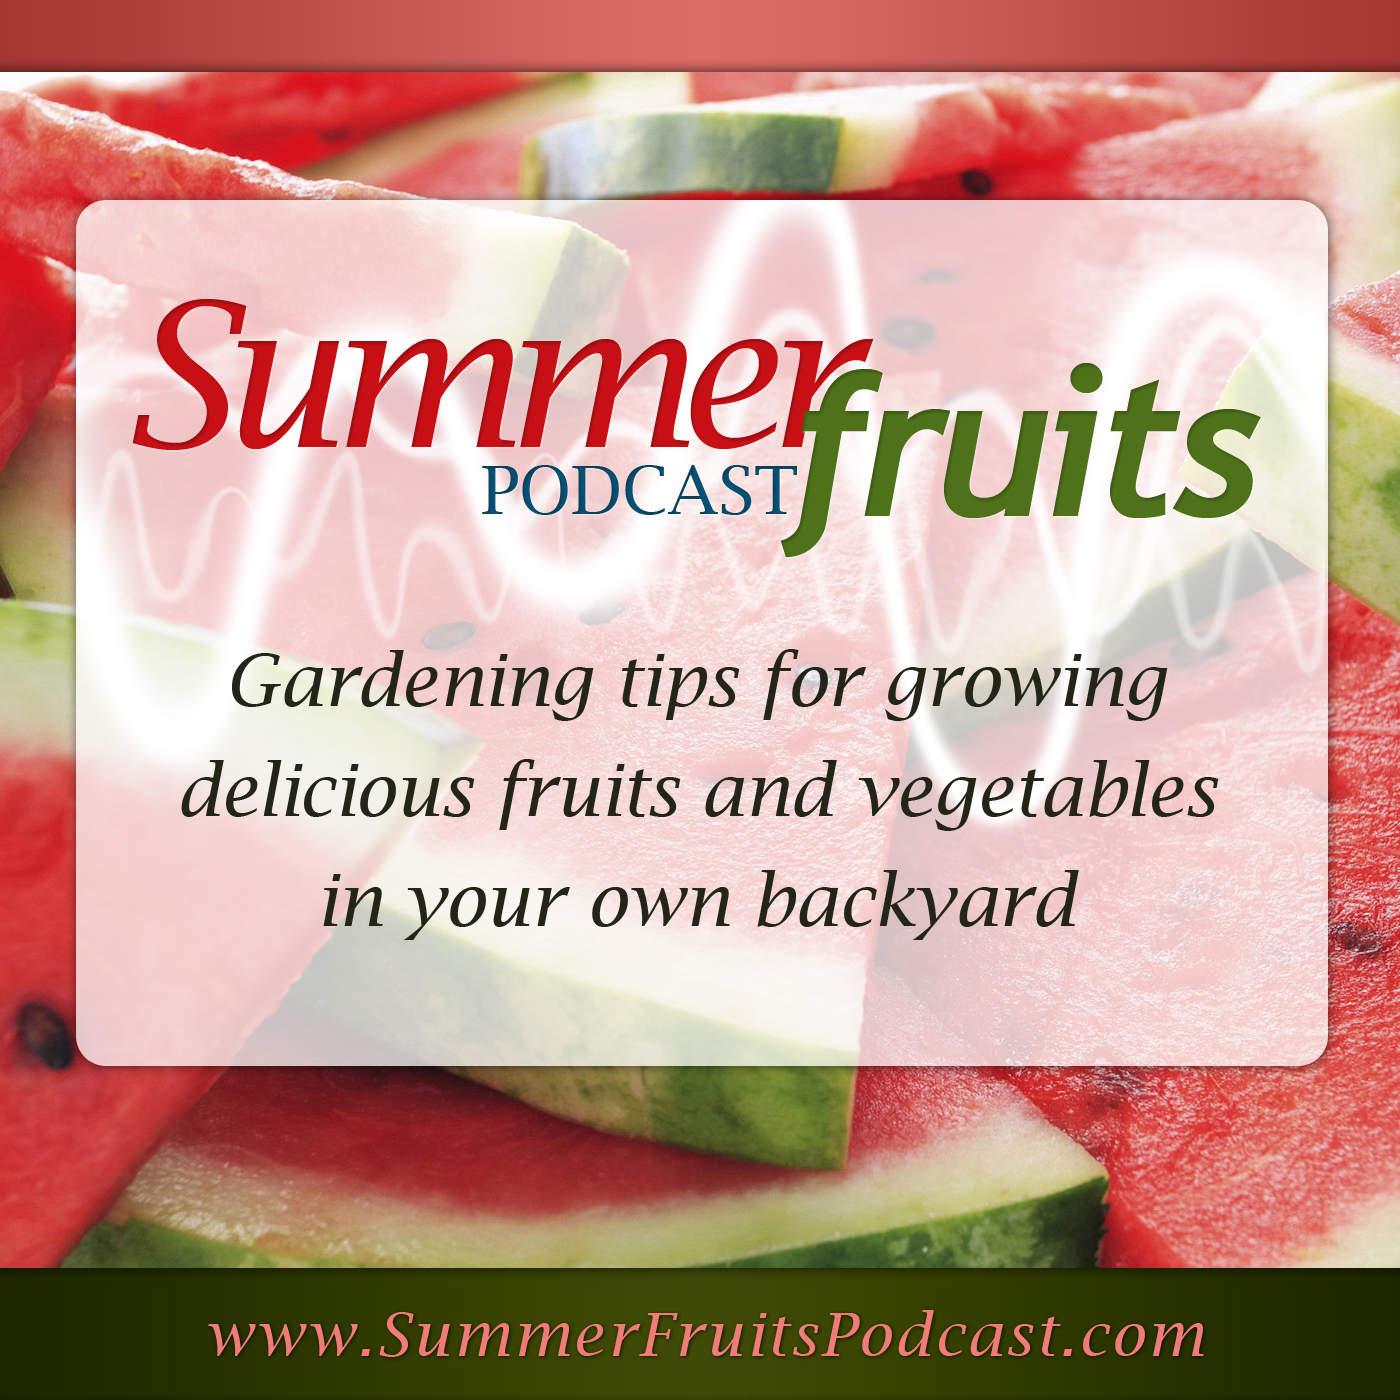 Summer Fruits Podcast